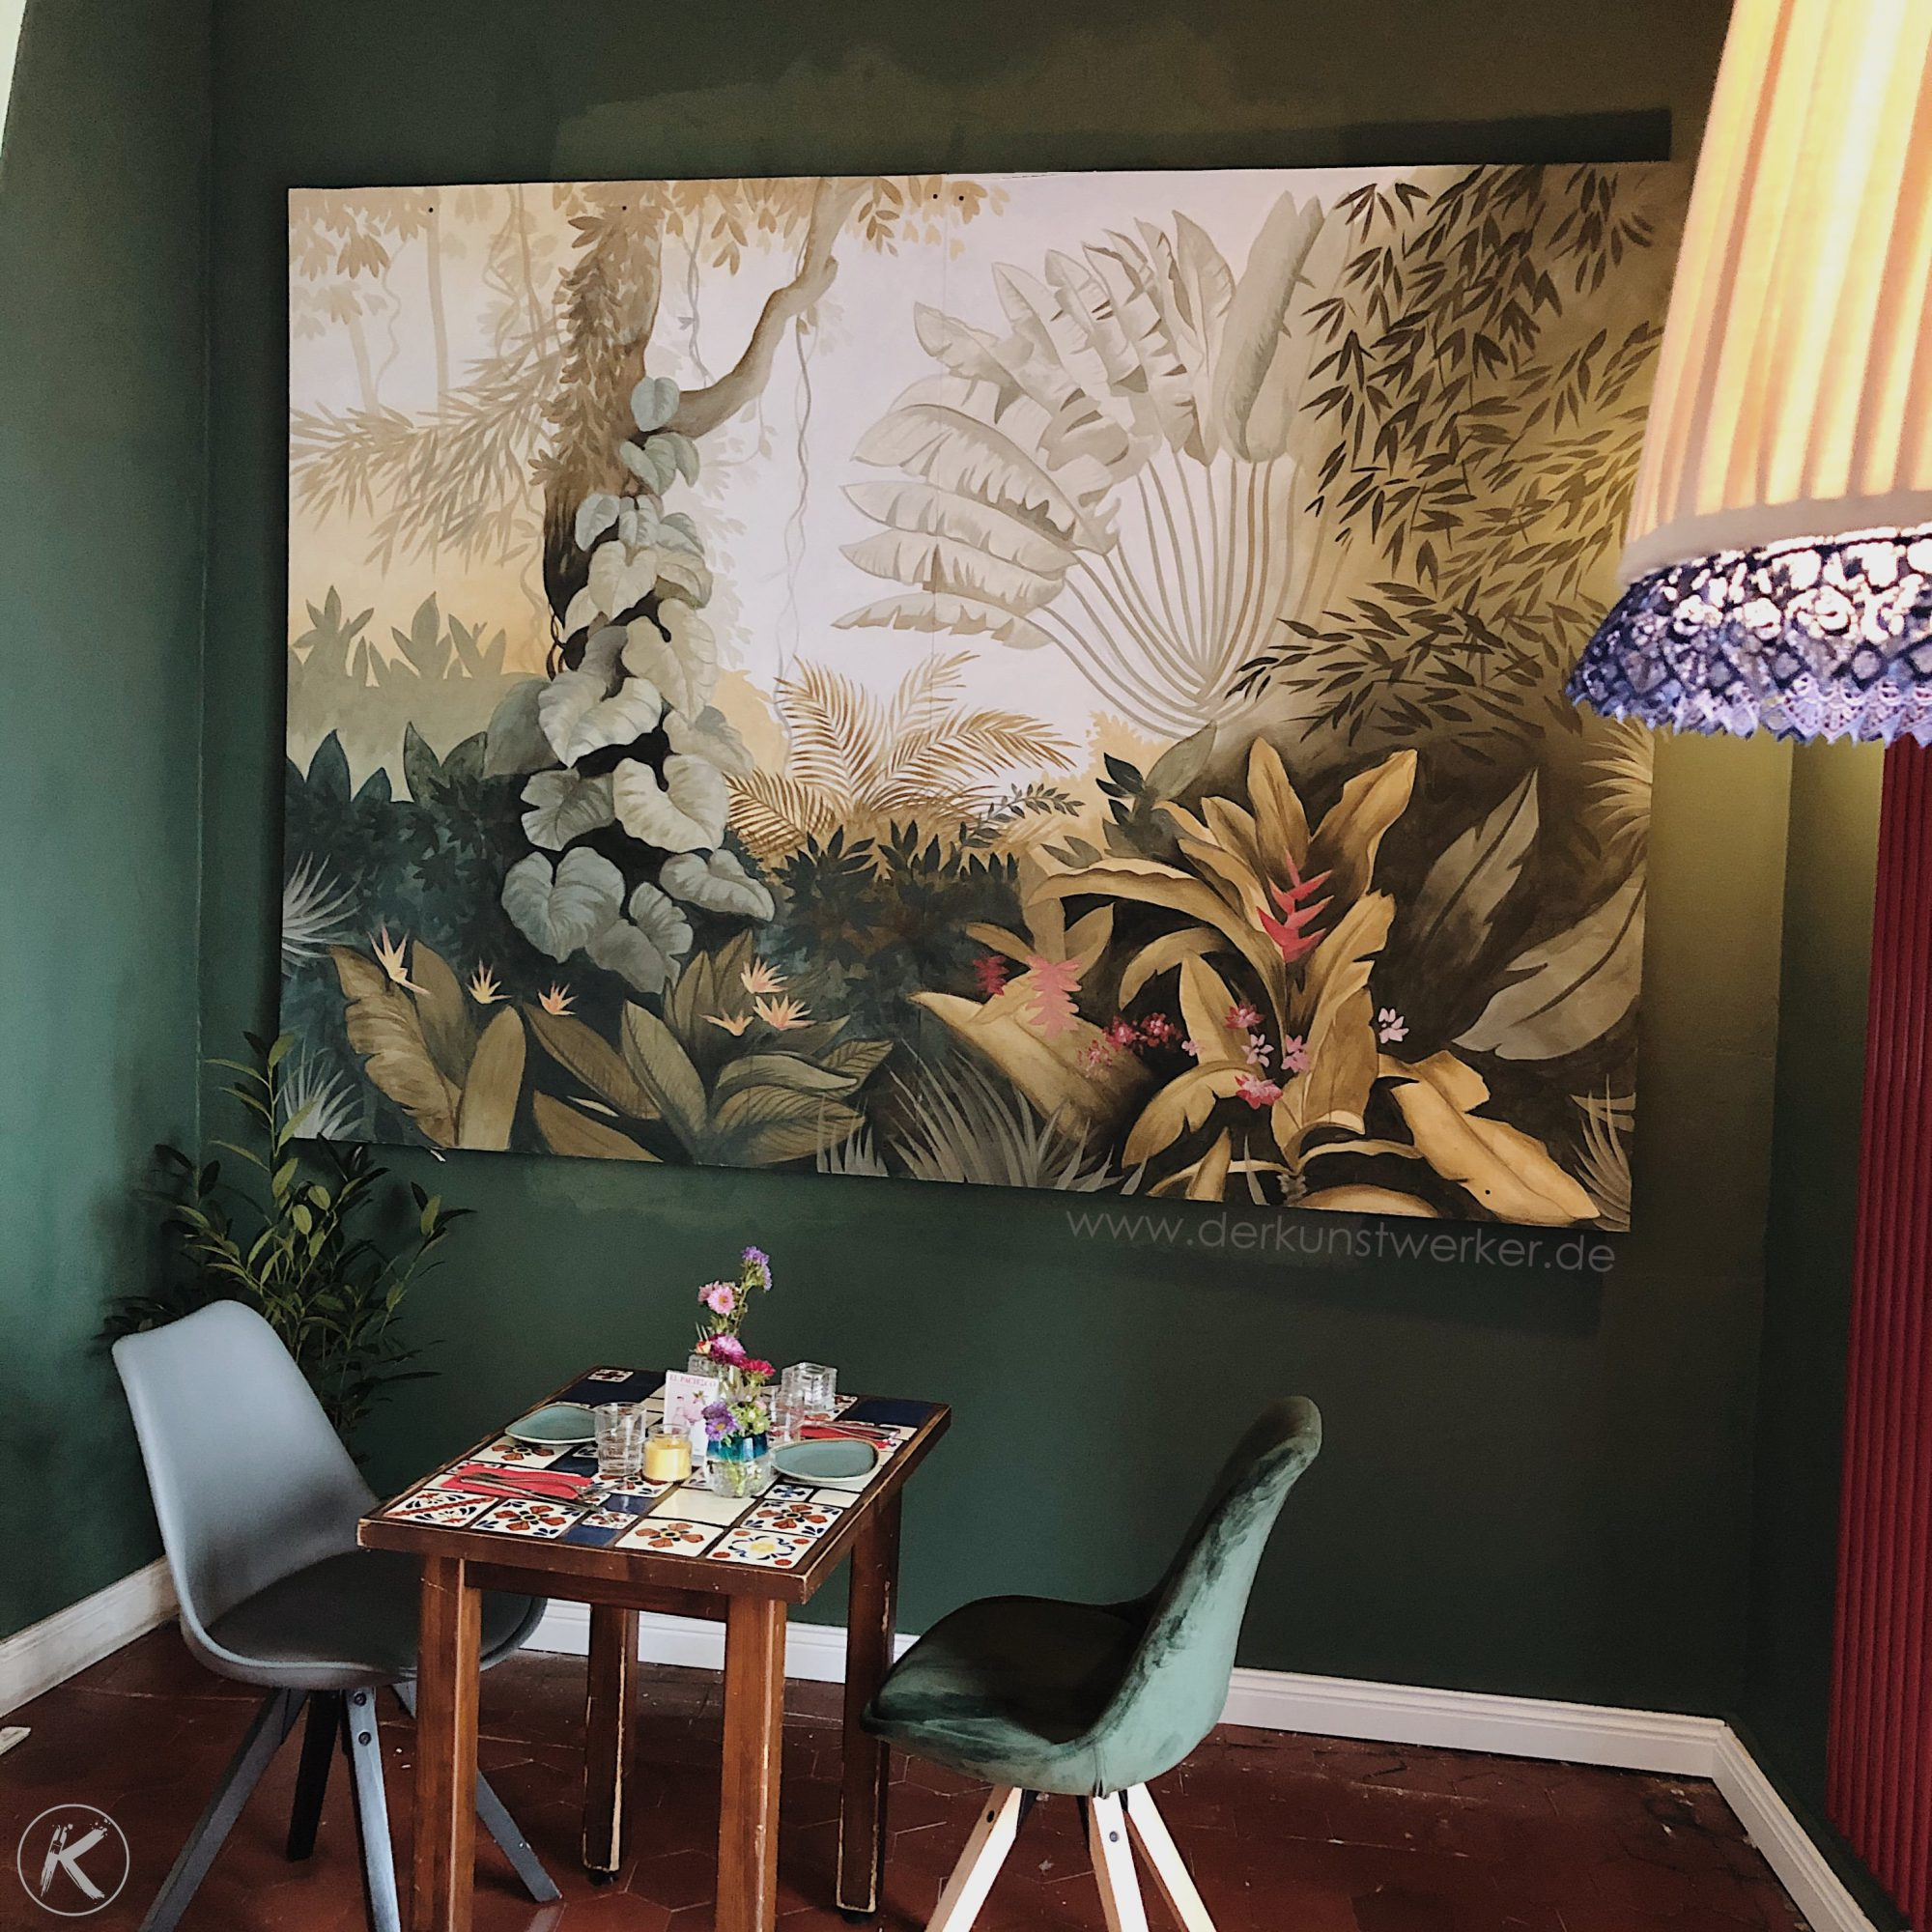 Greenery Malerei Dschungelmotiv